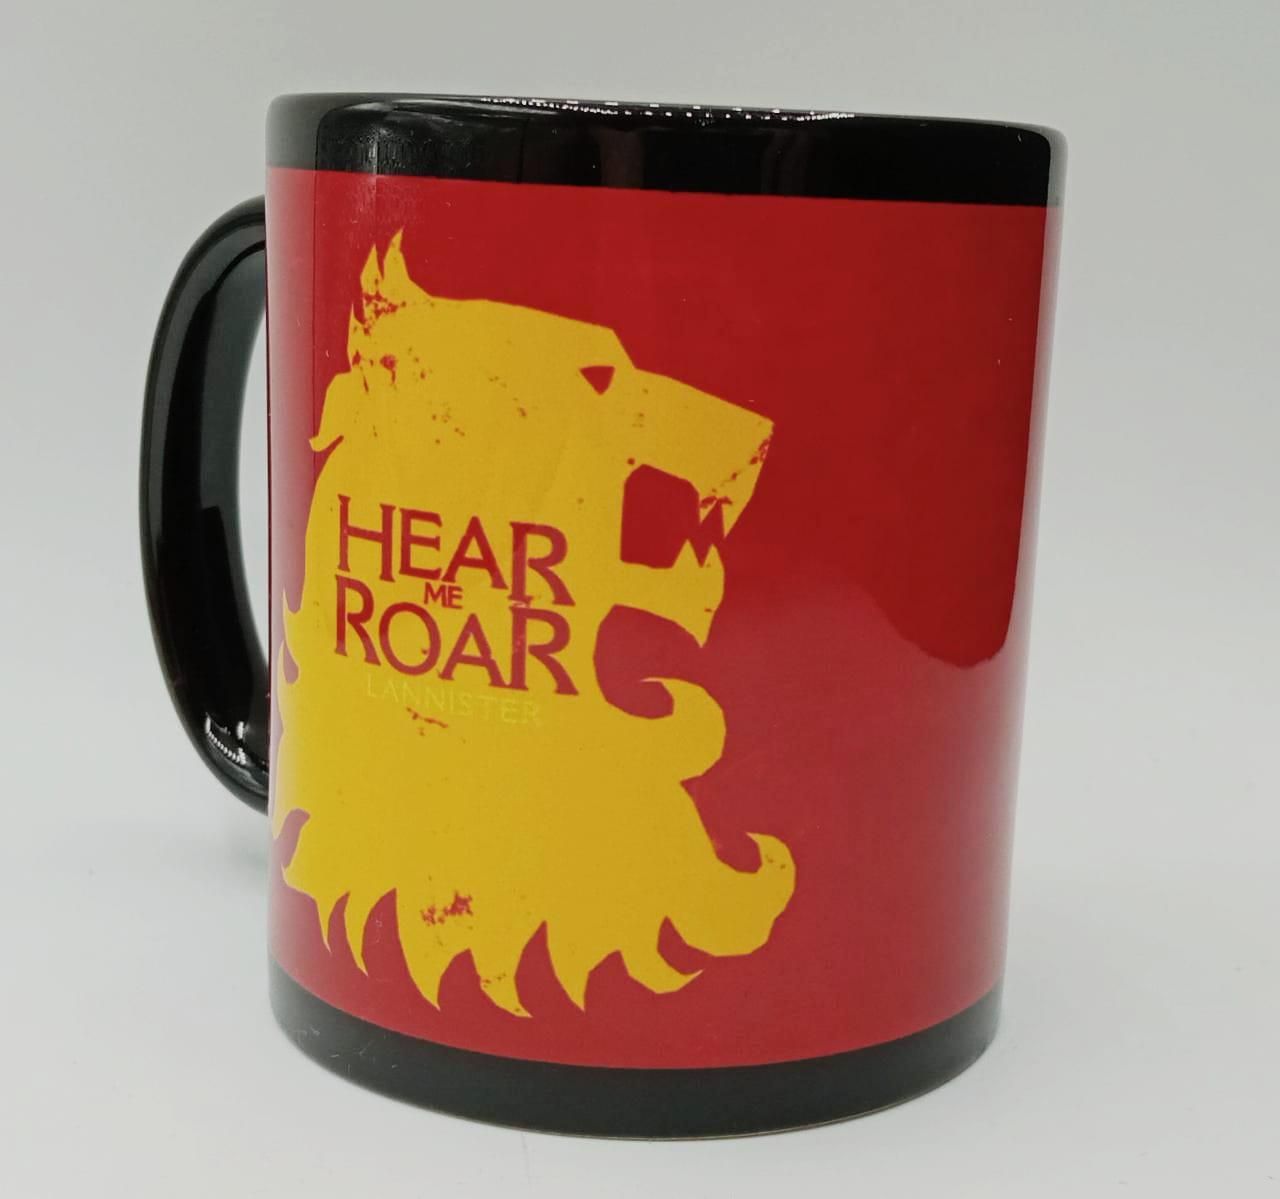 Caneca Hear Me Roar Lannister Game of Thrones (Preta)